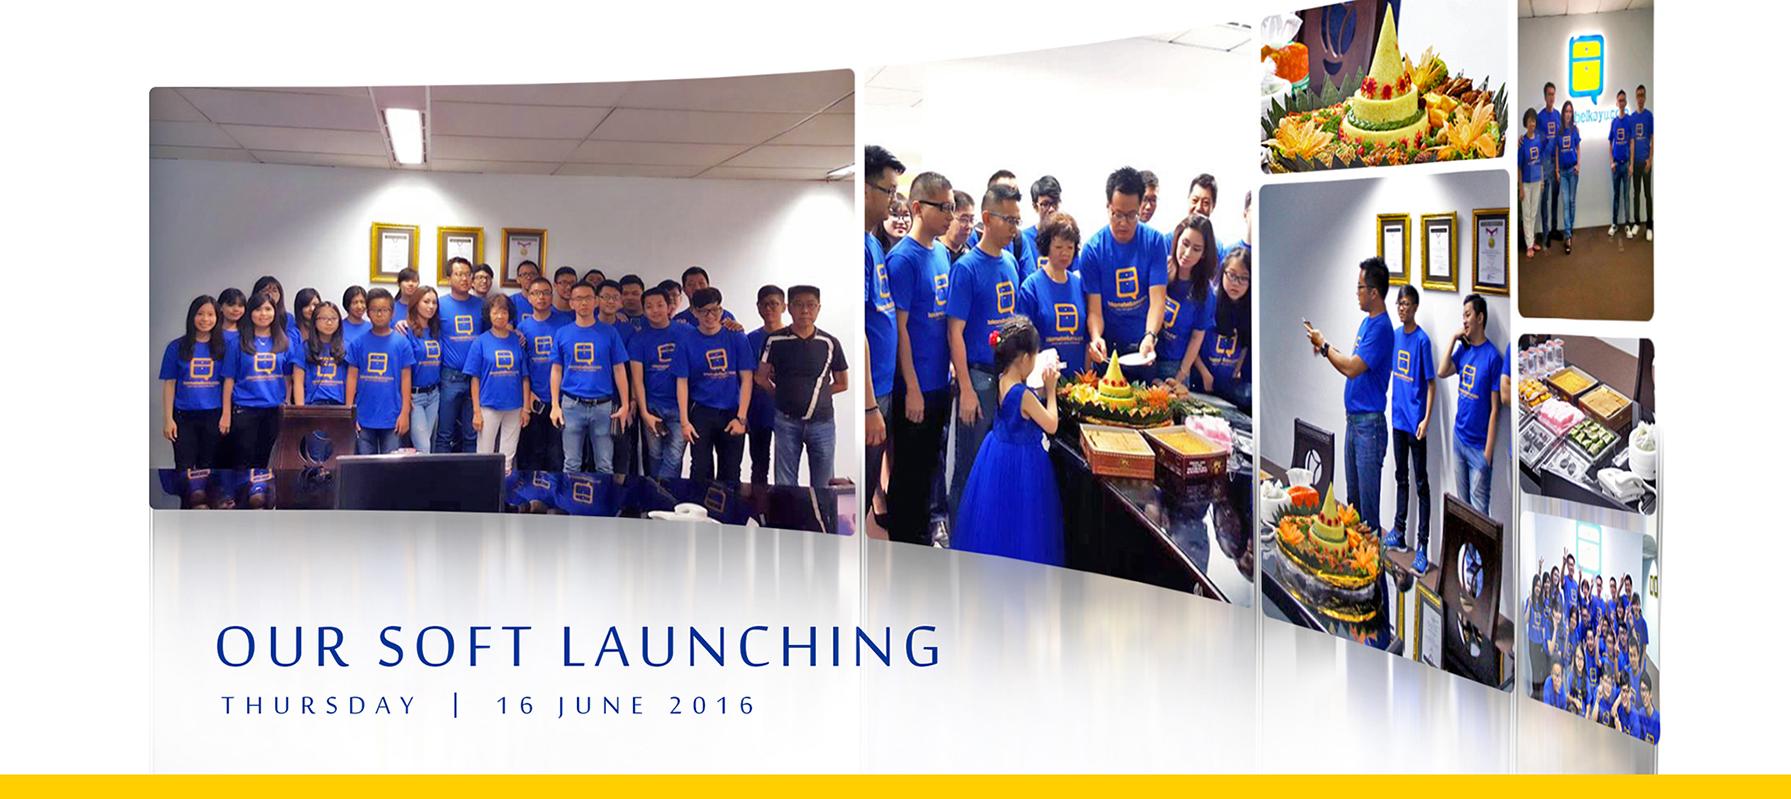 Soft Launching 16 June